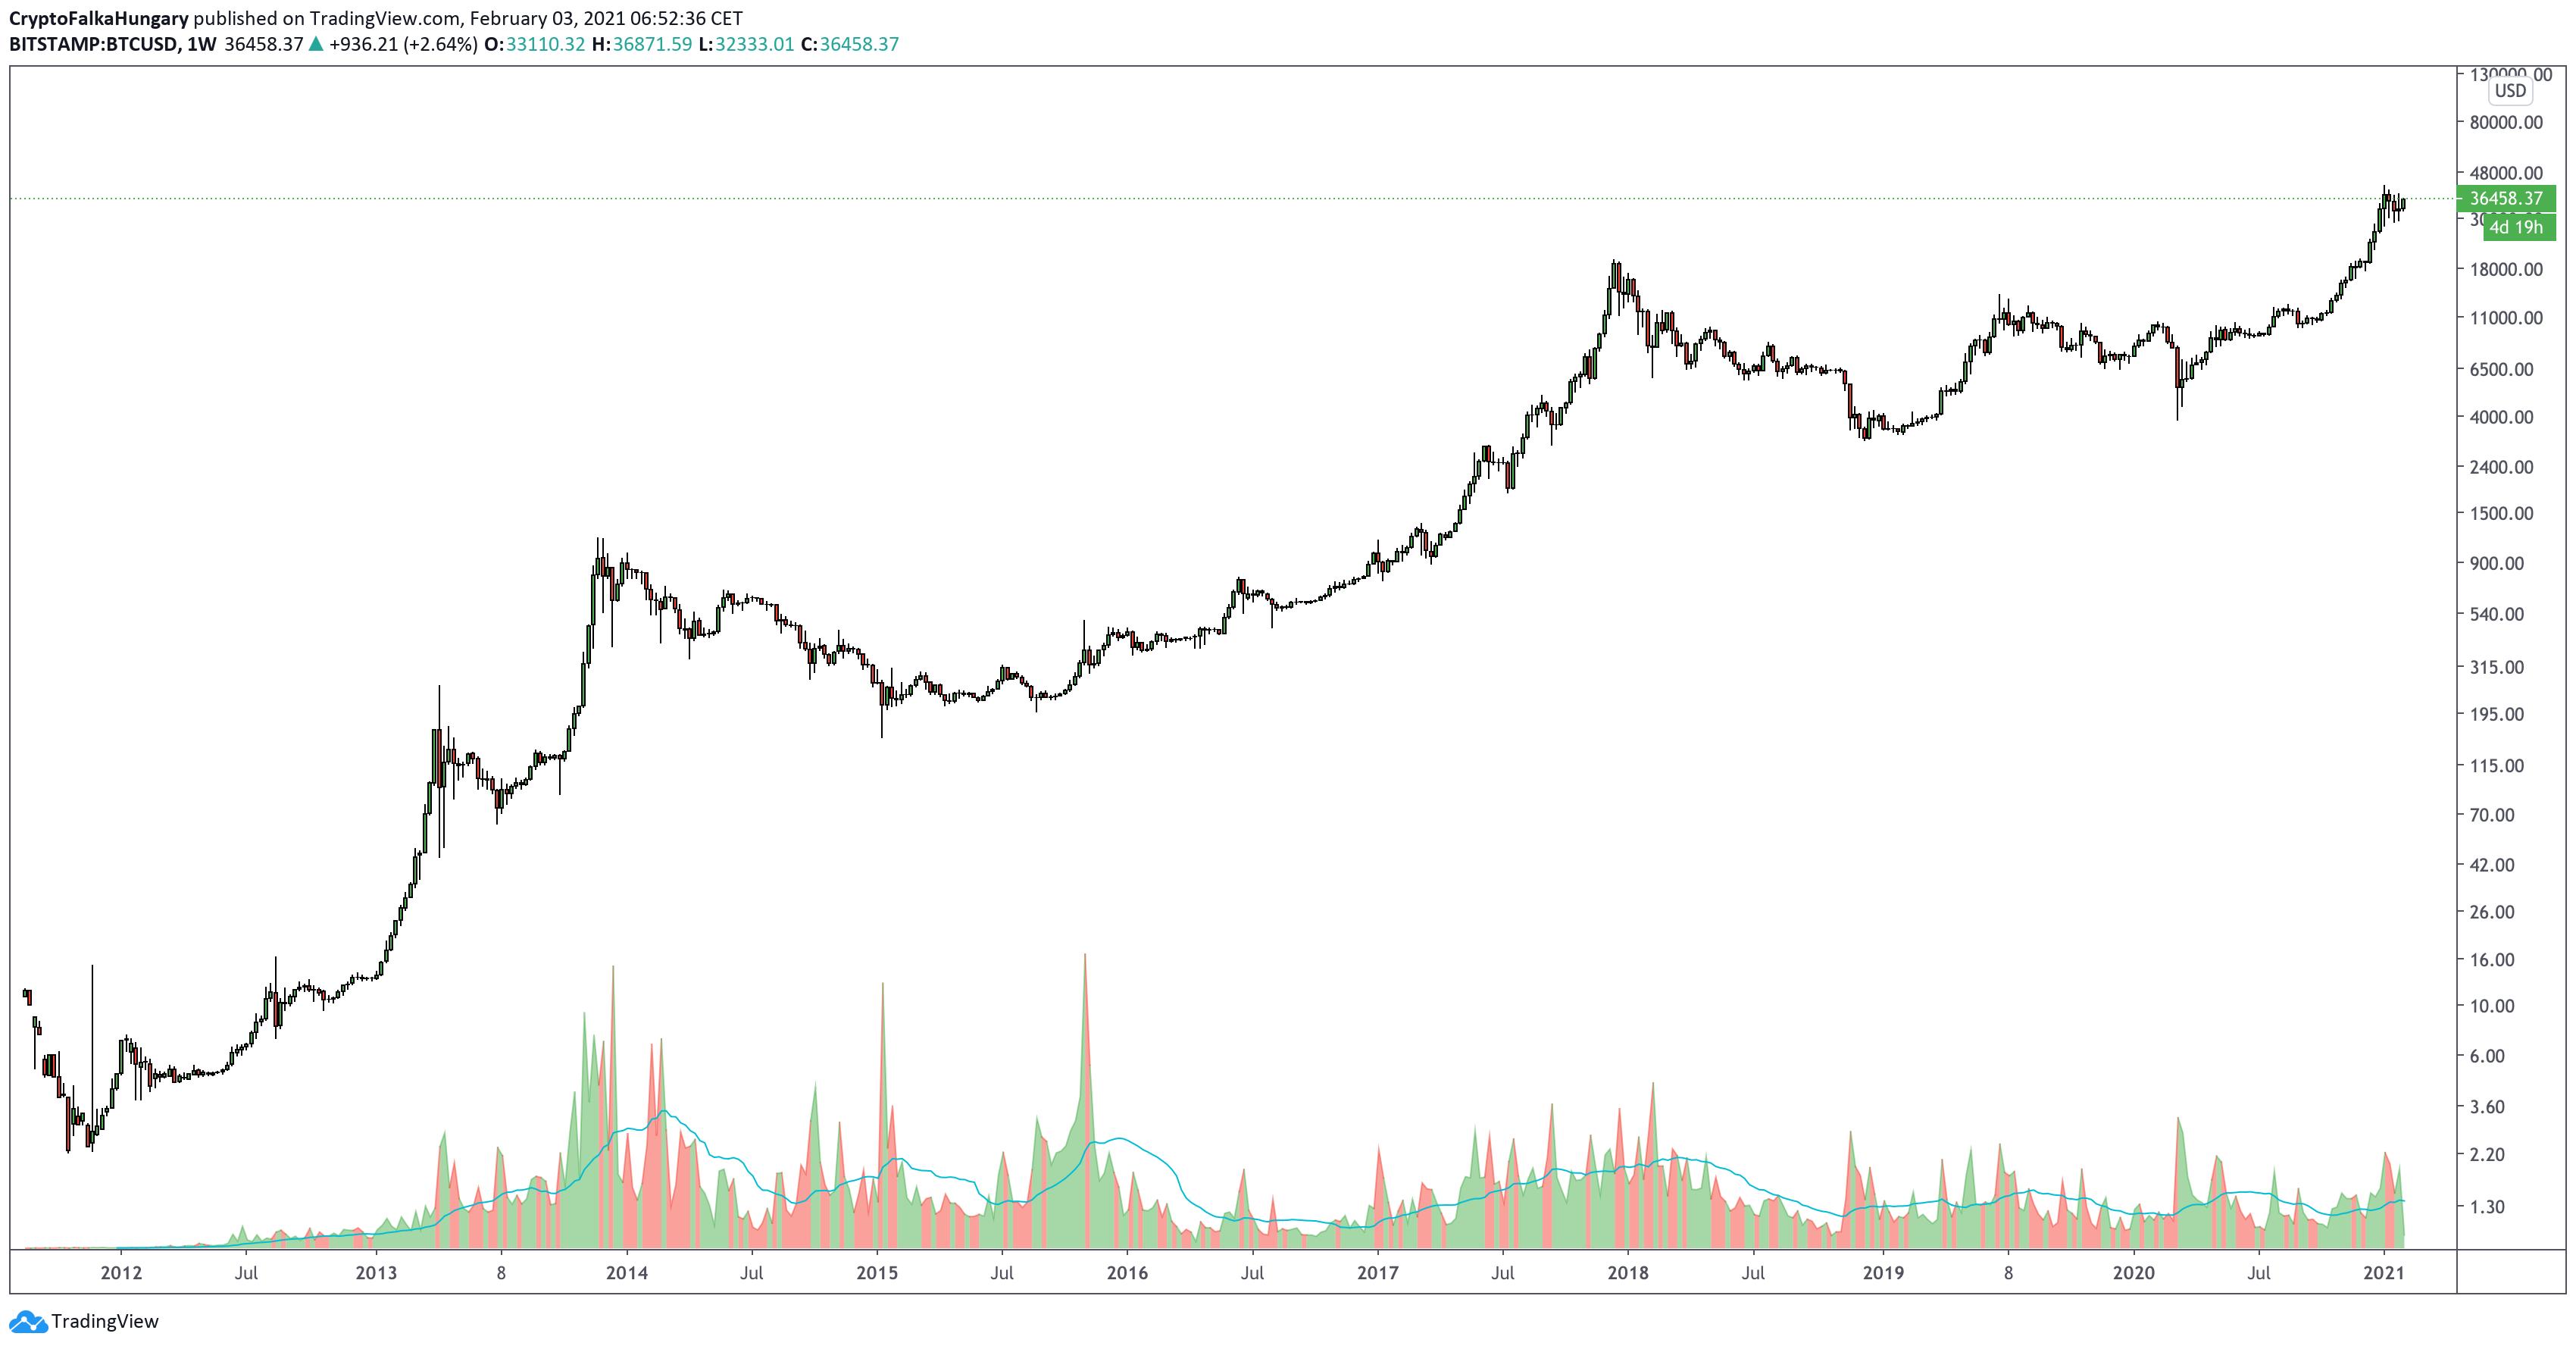 Bitcoin árfolyam 2012-2021 I Cryptofalka